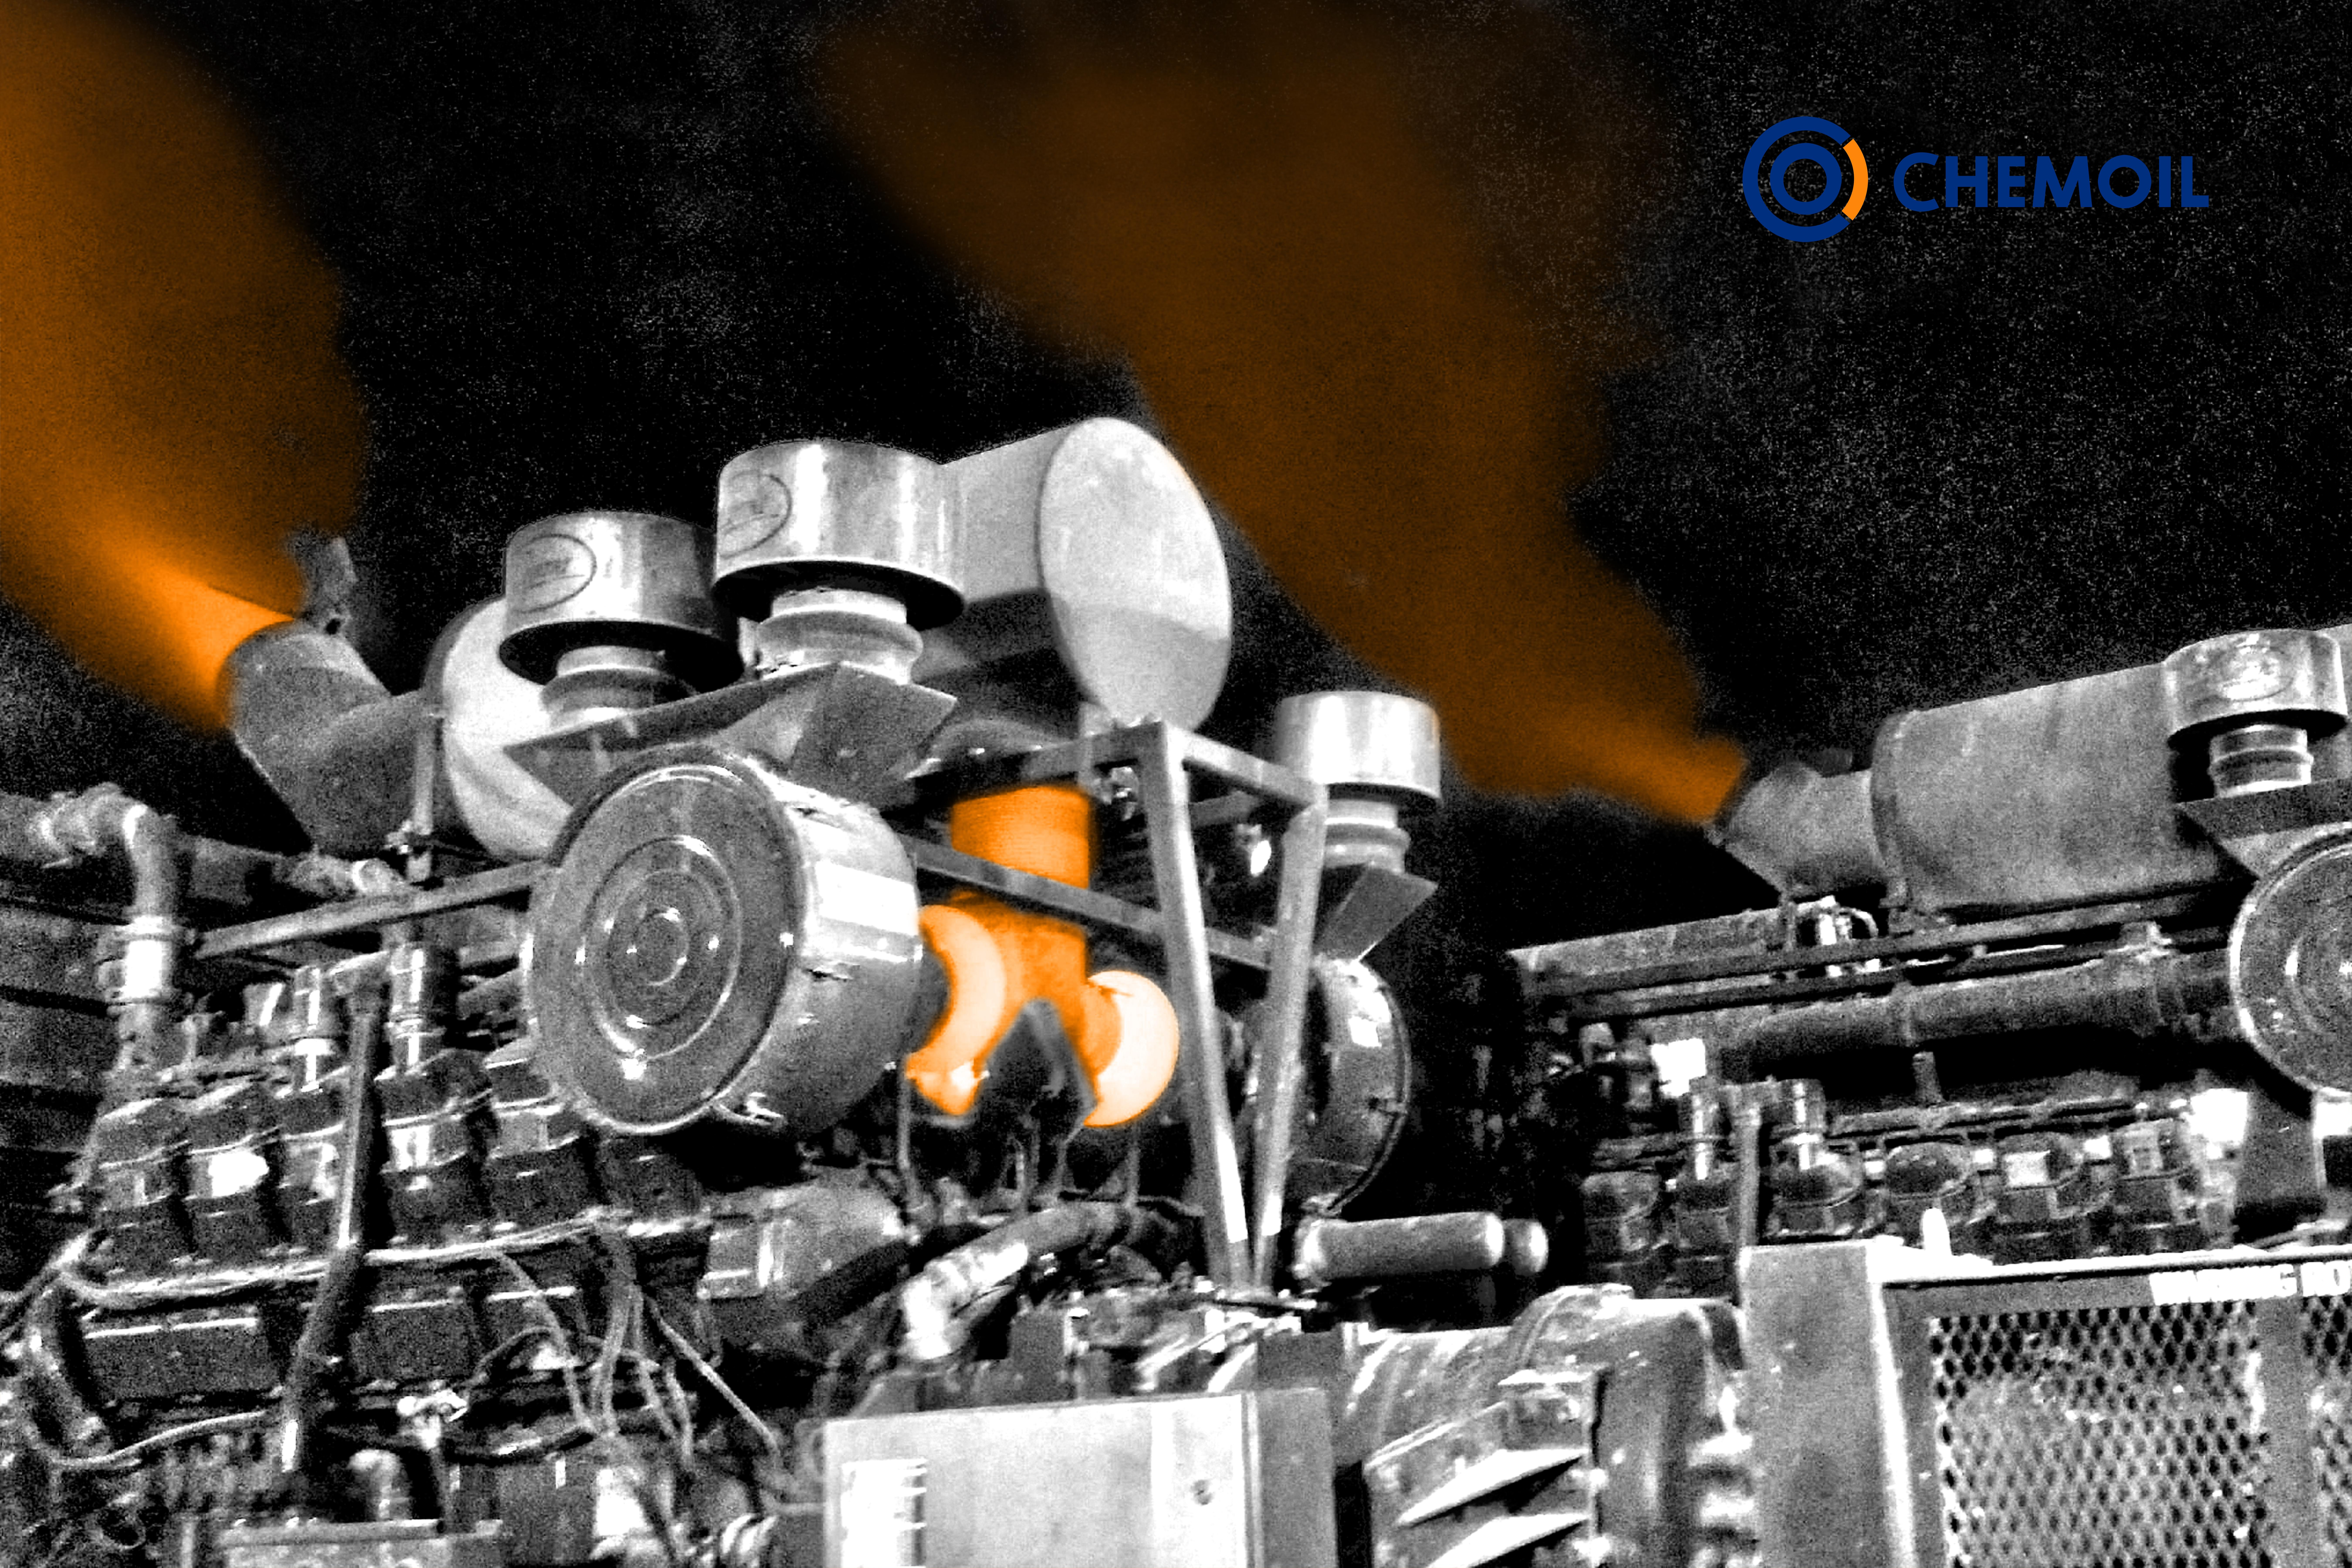 Frac Pump Engine at Night b